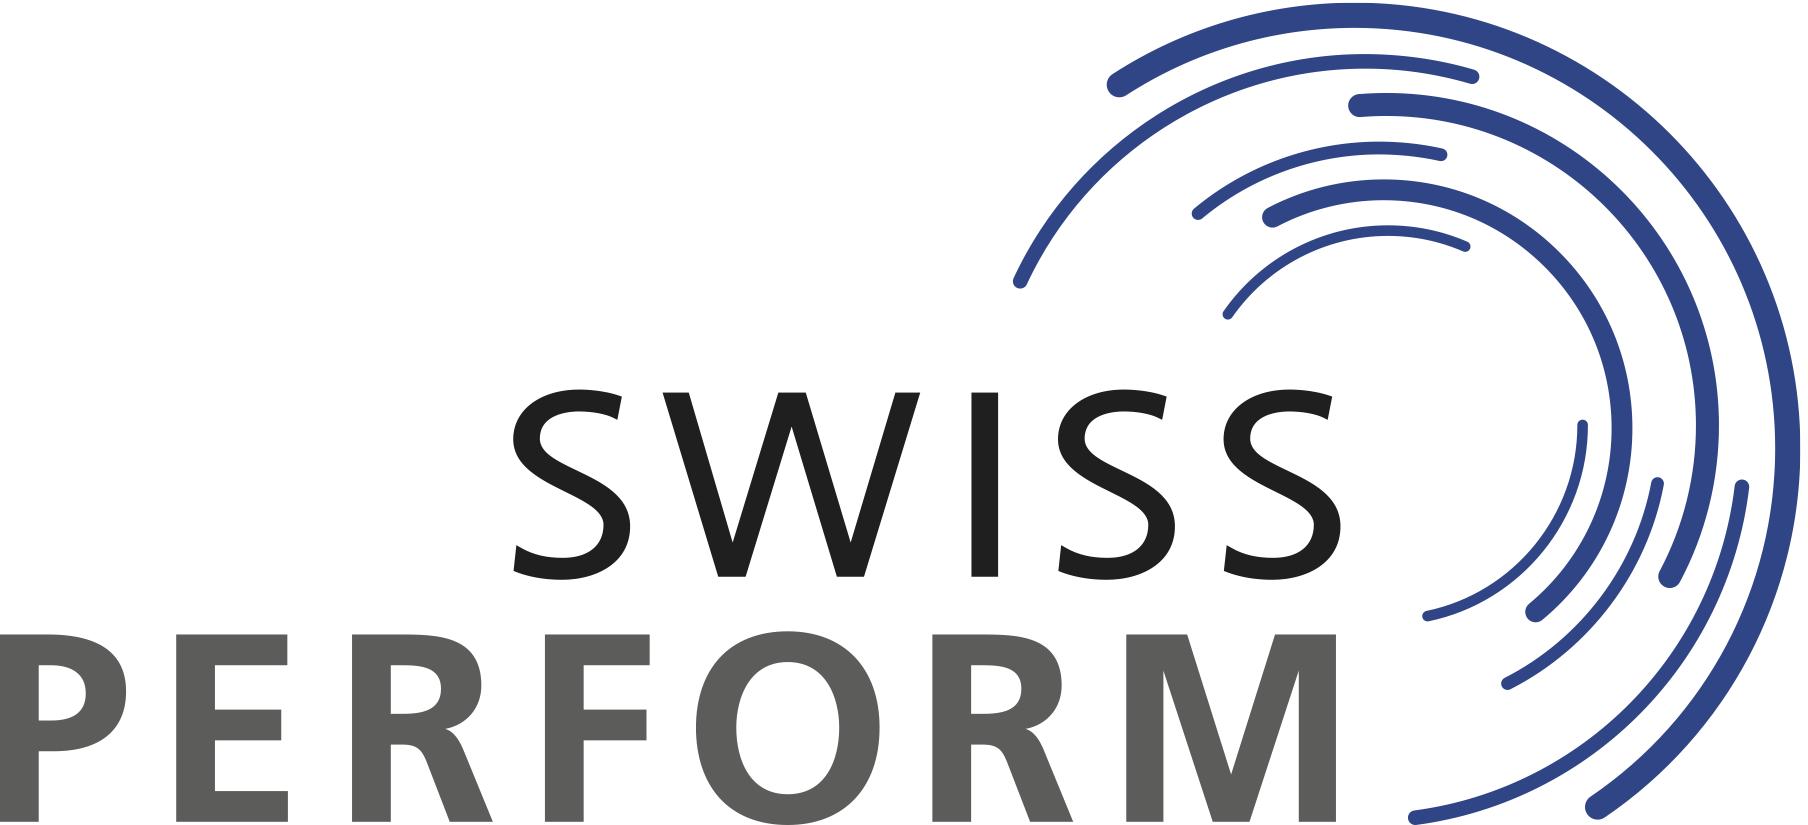 SWP-Logo-2013_CMYK_01